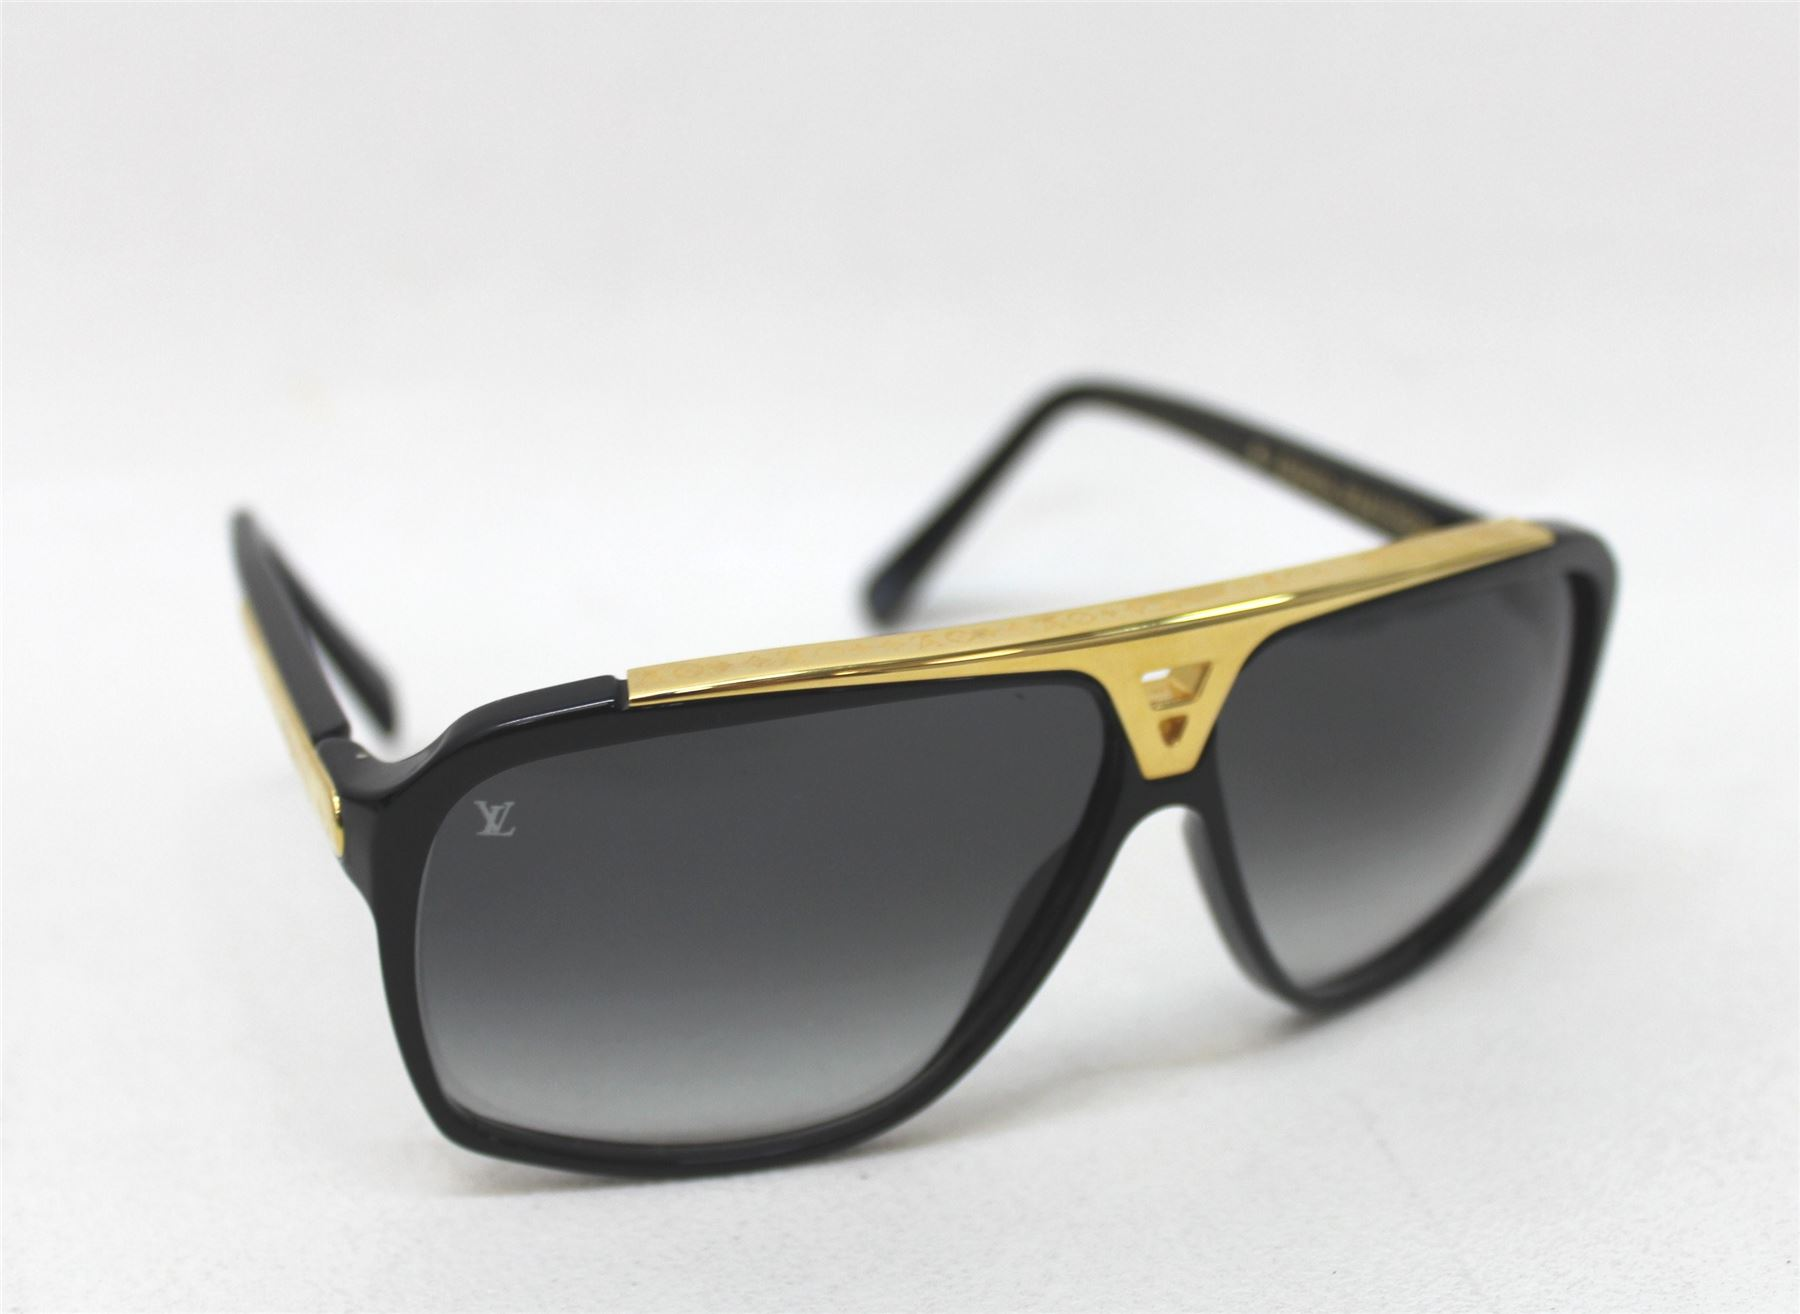 a0c61b5318ef Louis Vuitton Sunglasses Replica Ebay